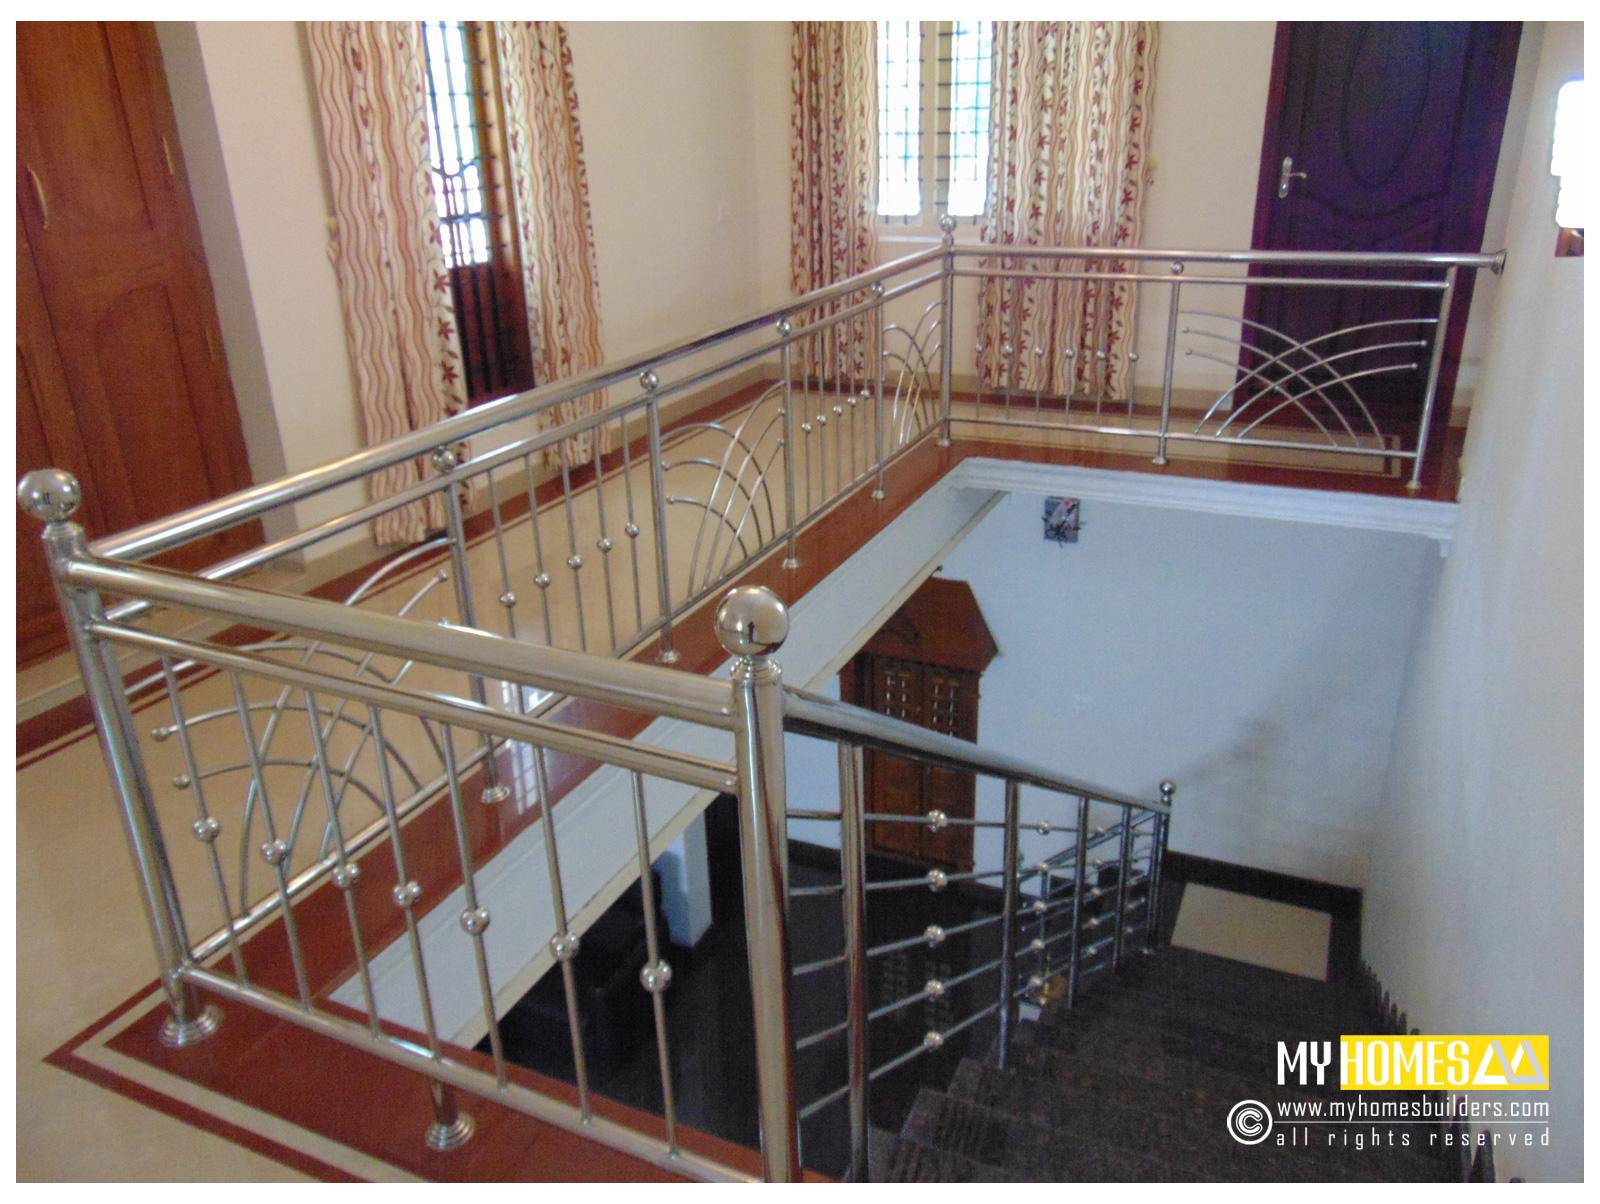 Kerala homes staircase, staircase ideas kerala homes, staircase interior, homes staircases, staircase collections